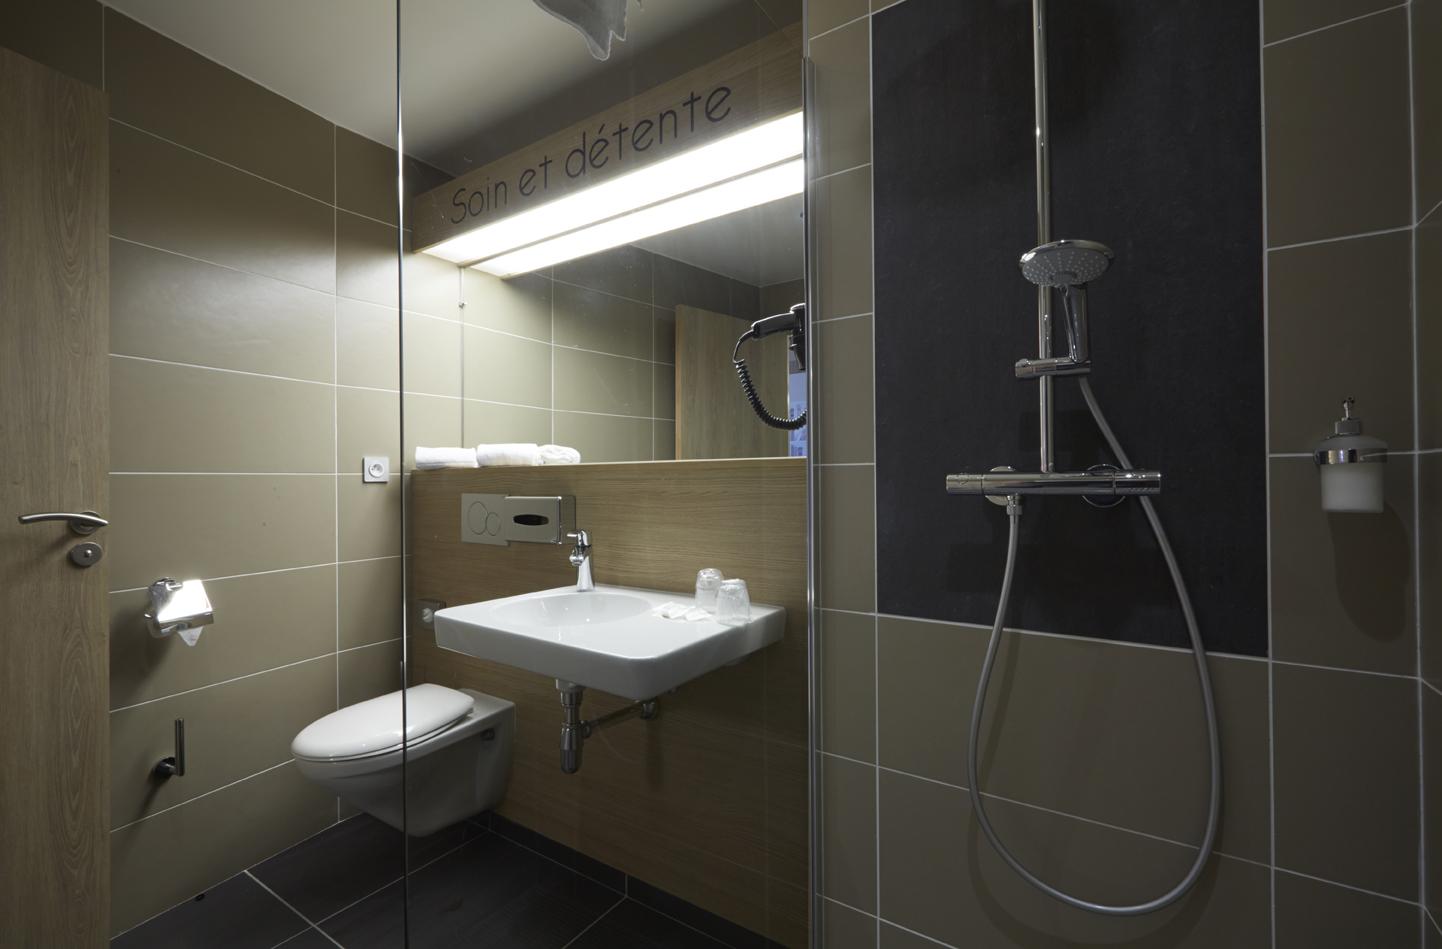 hotel kyriad angers beaucouze - géraldine fourny - decoratrice d interieur nantes 44 - décoration hotel 3